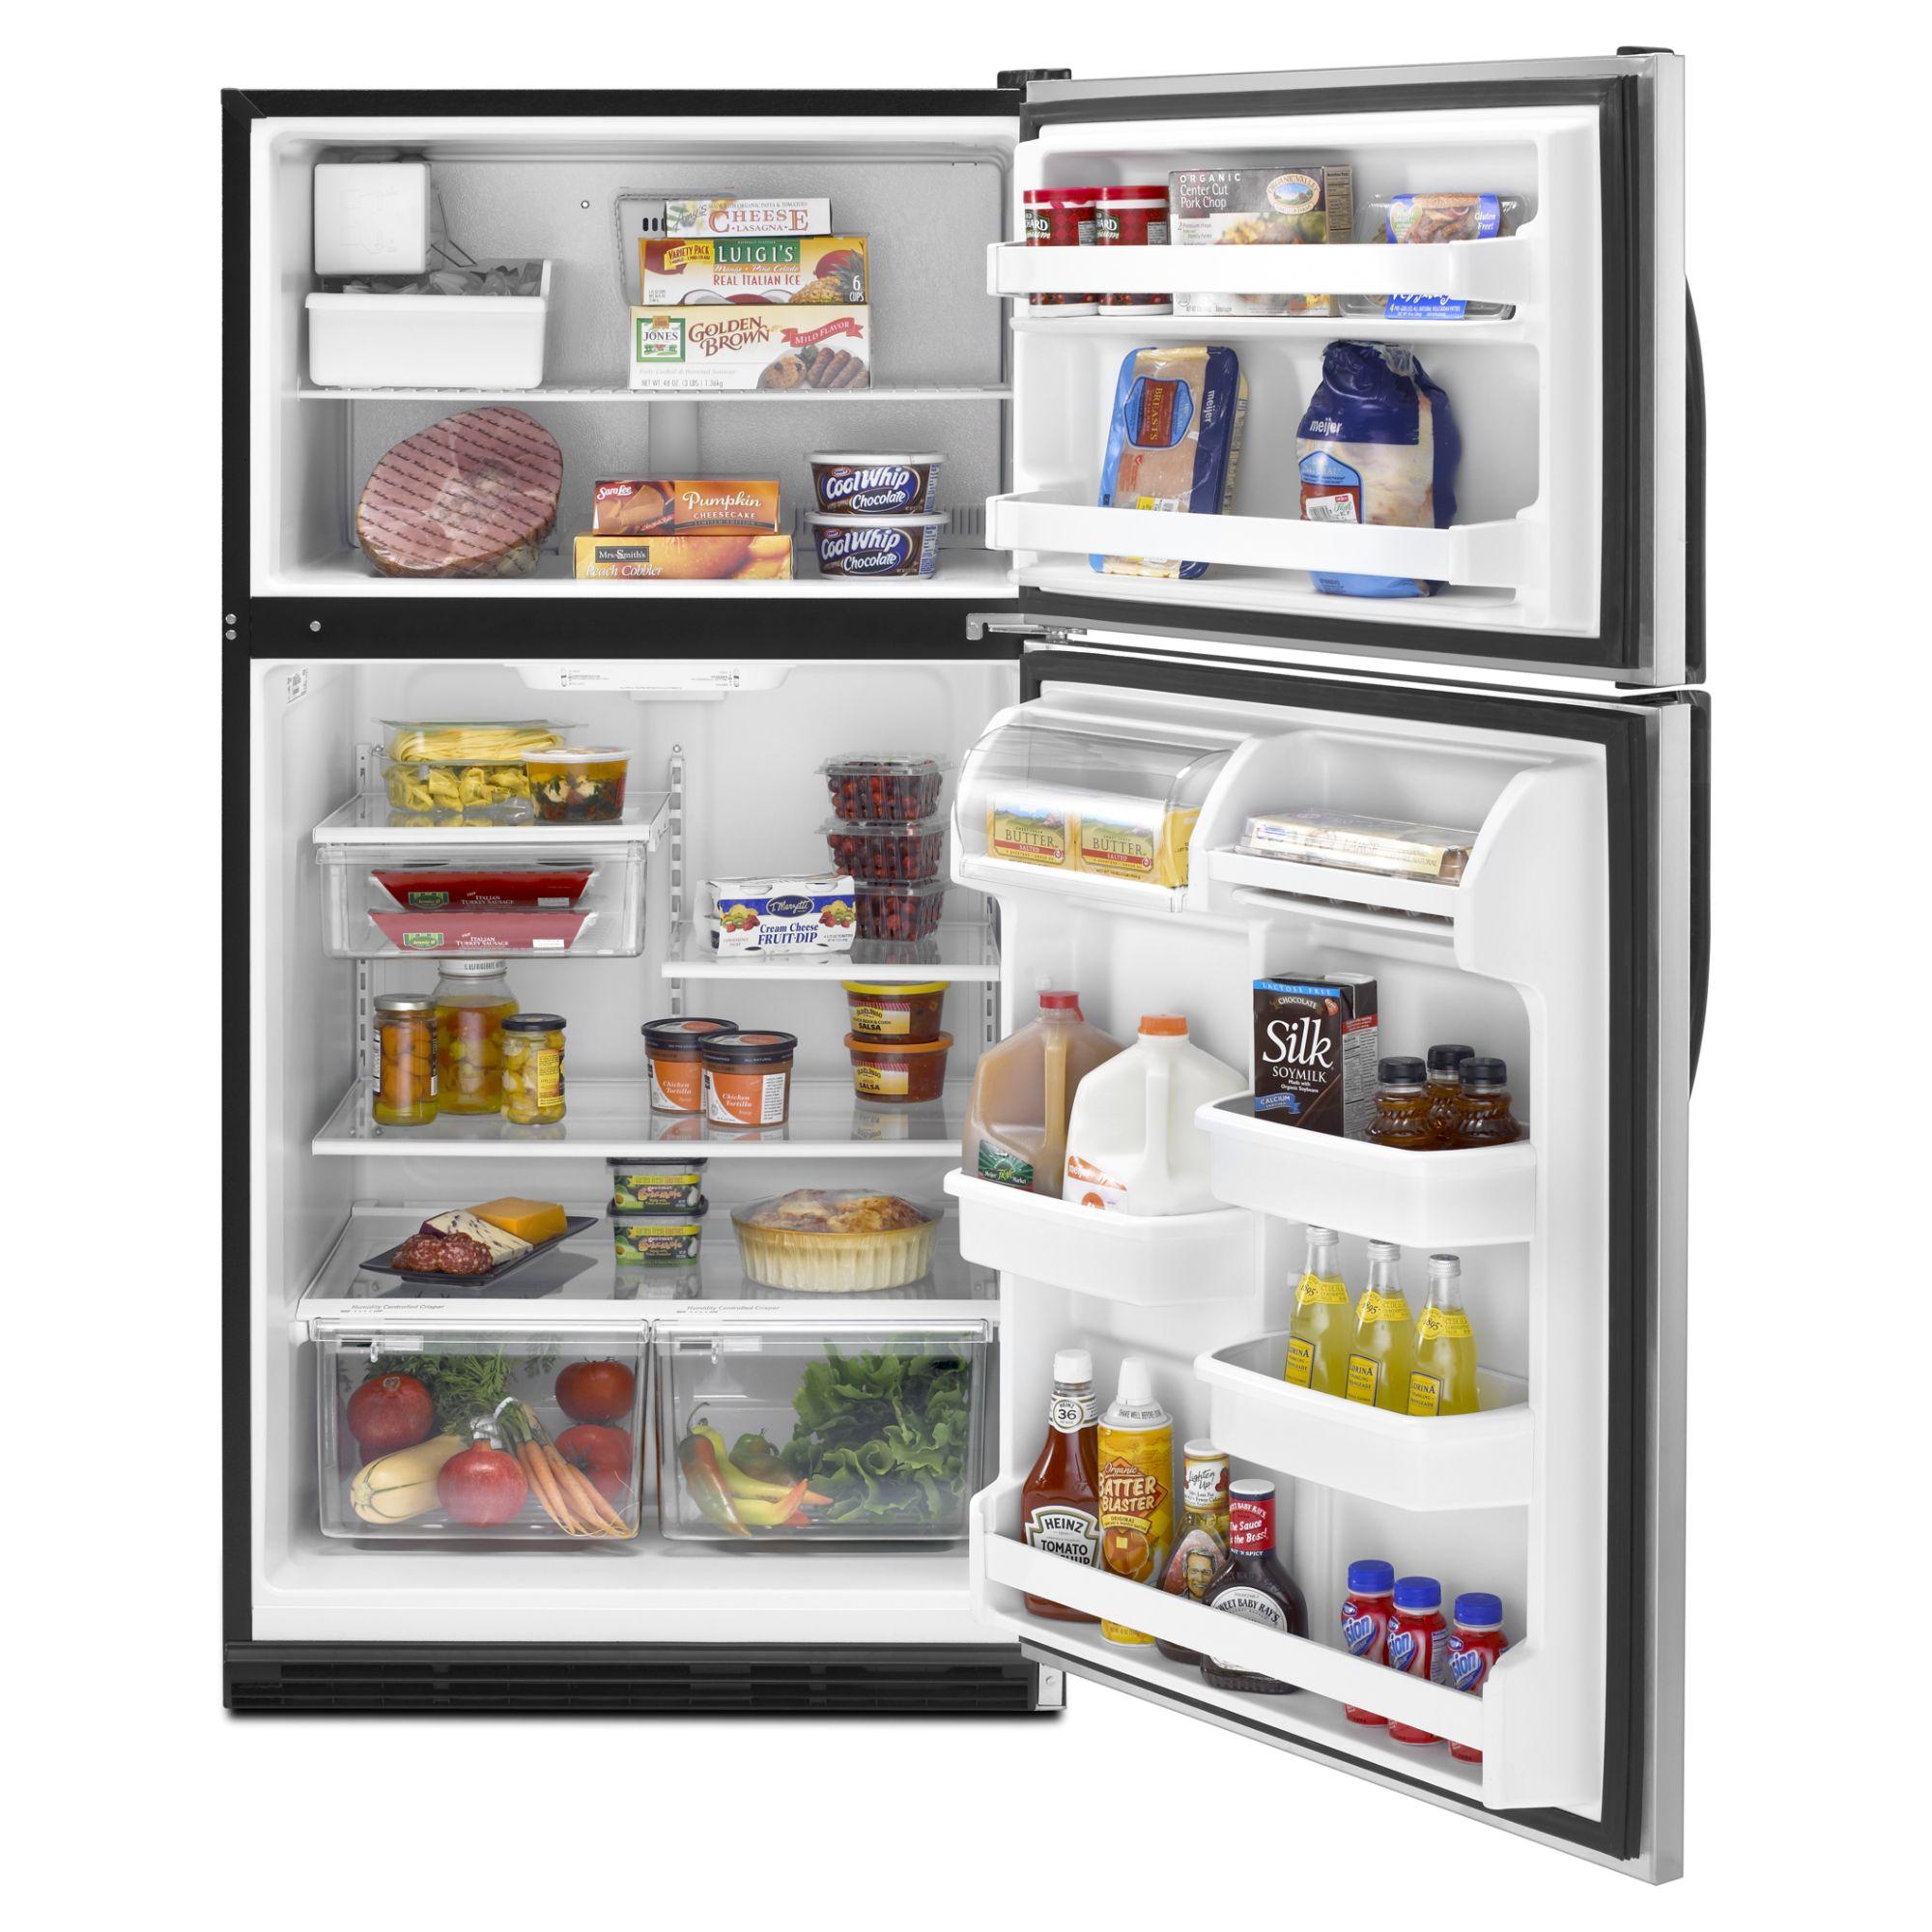 Whirlpool 20.9 cu. ft. Top-Freezer Refrigerator - Stainless Steel